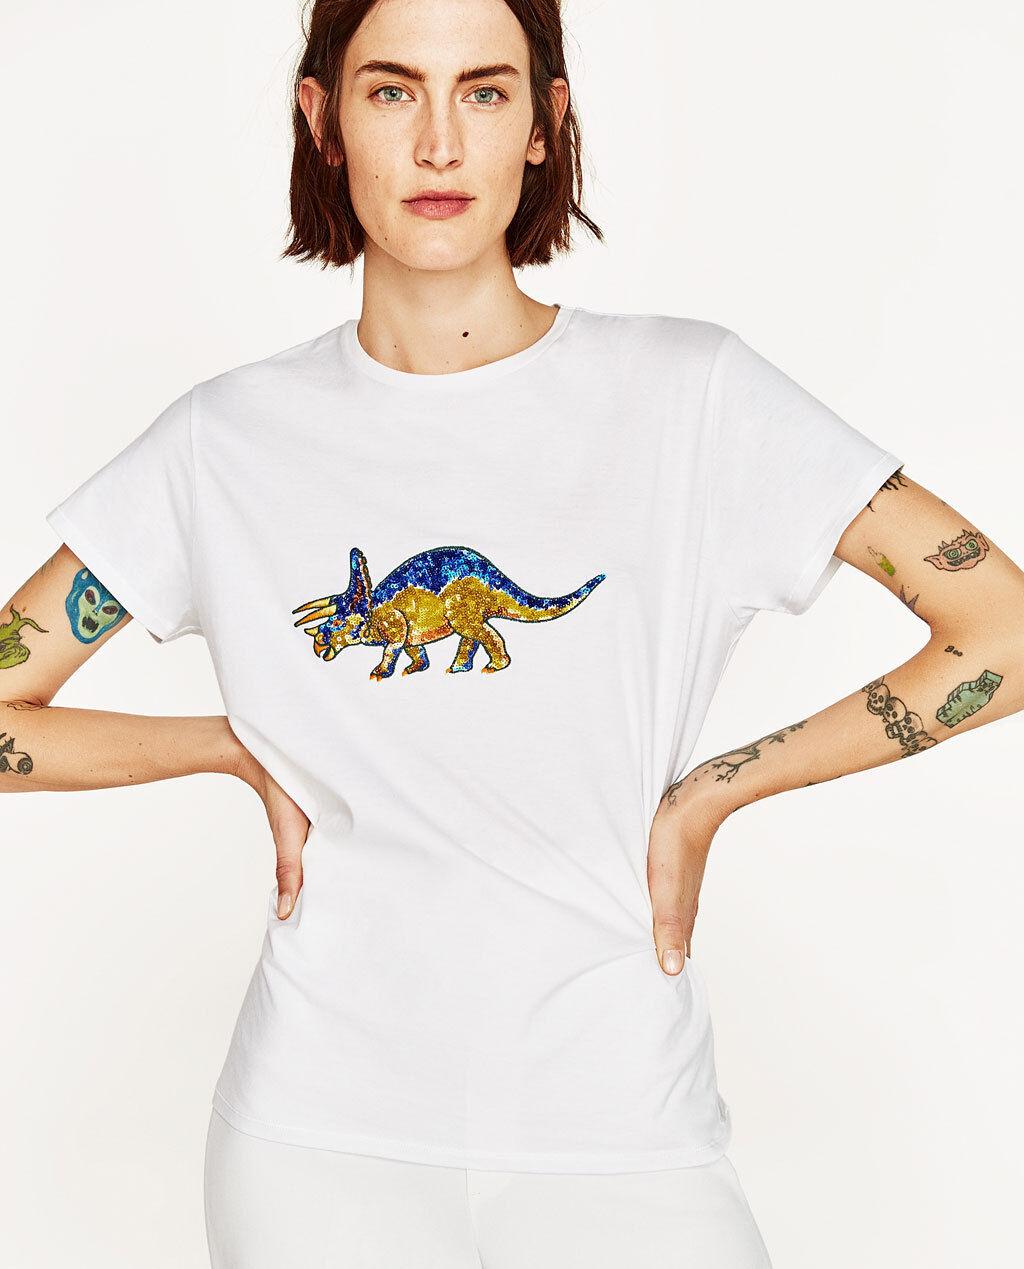 7600b43371 ZARA Dinosaur Applique Short Sleeve T-Shirt Details Woman Authentic 2654/055